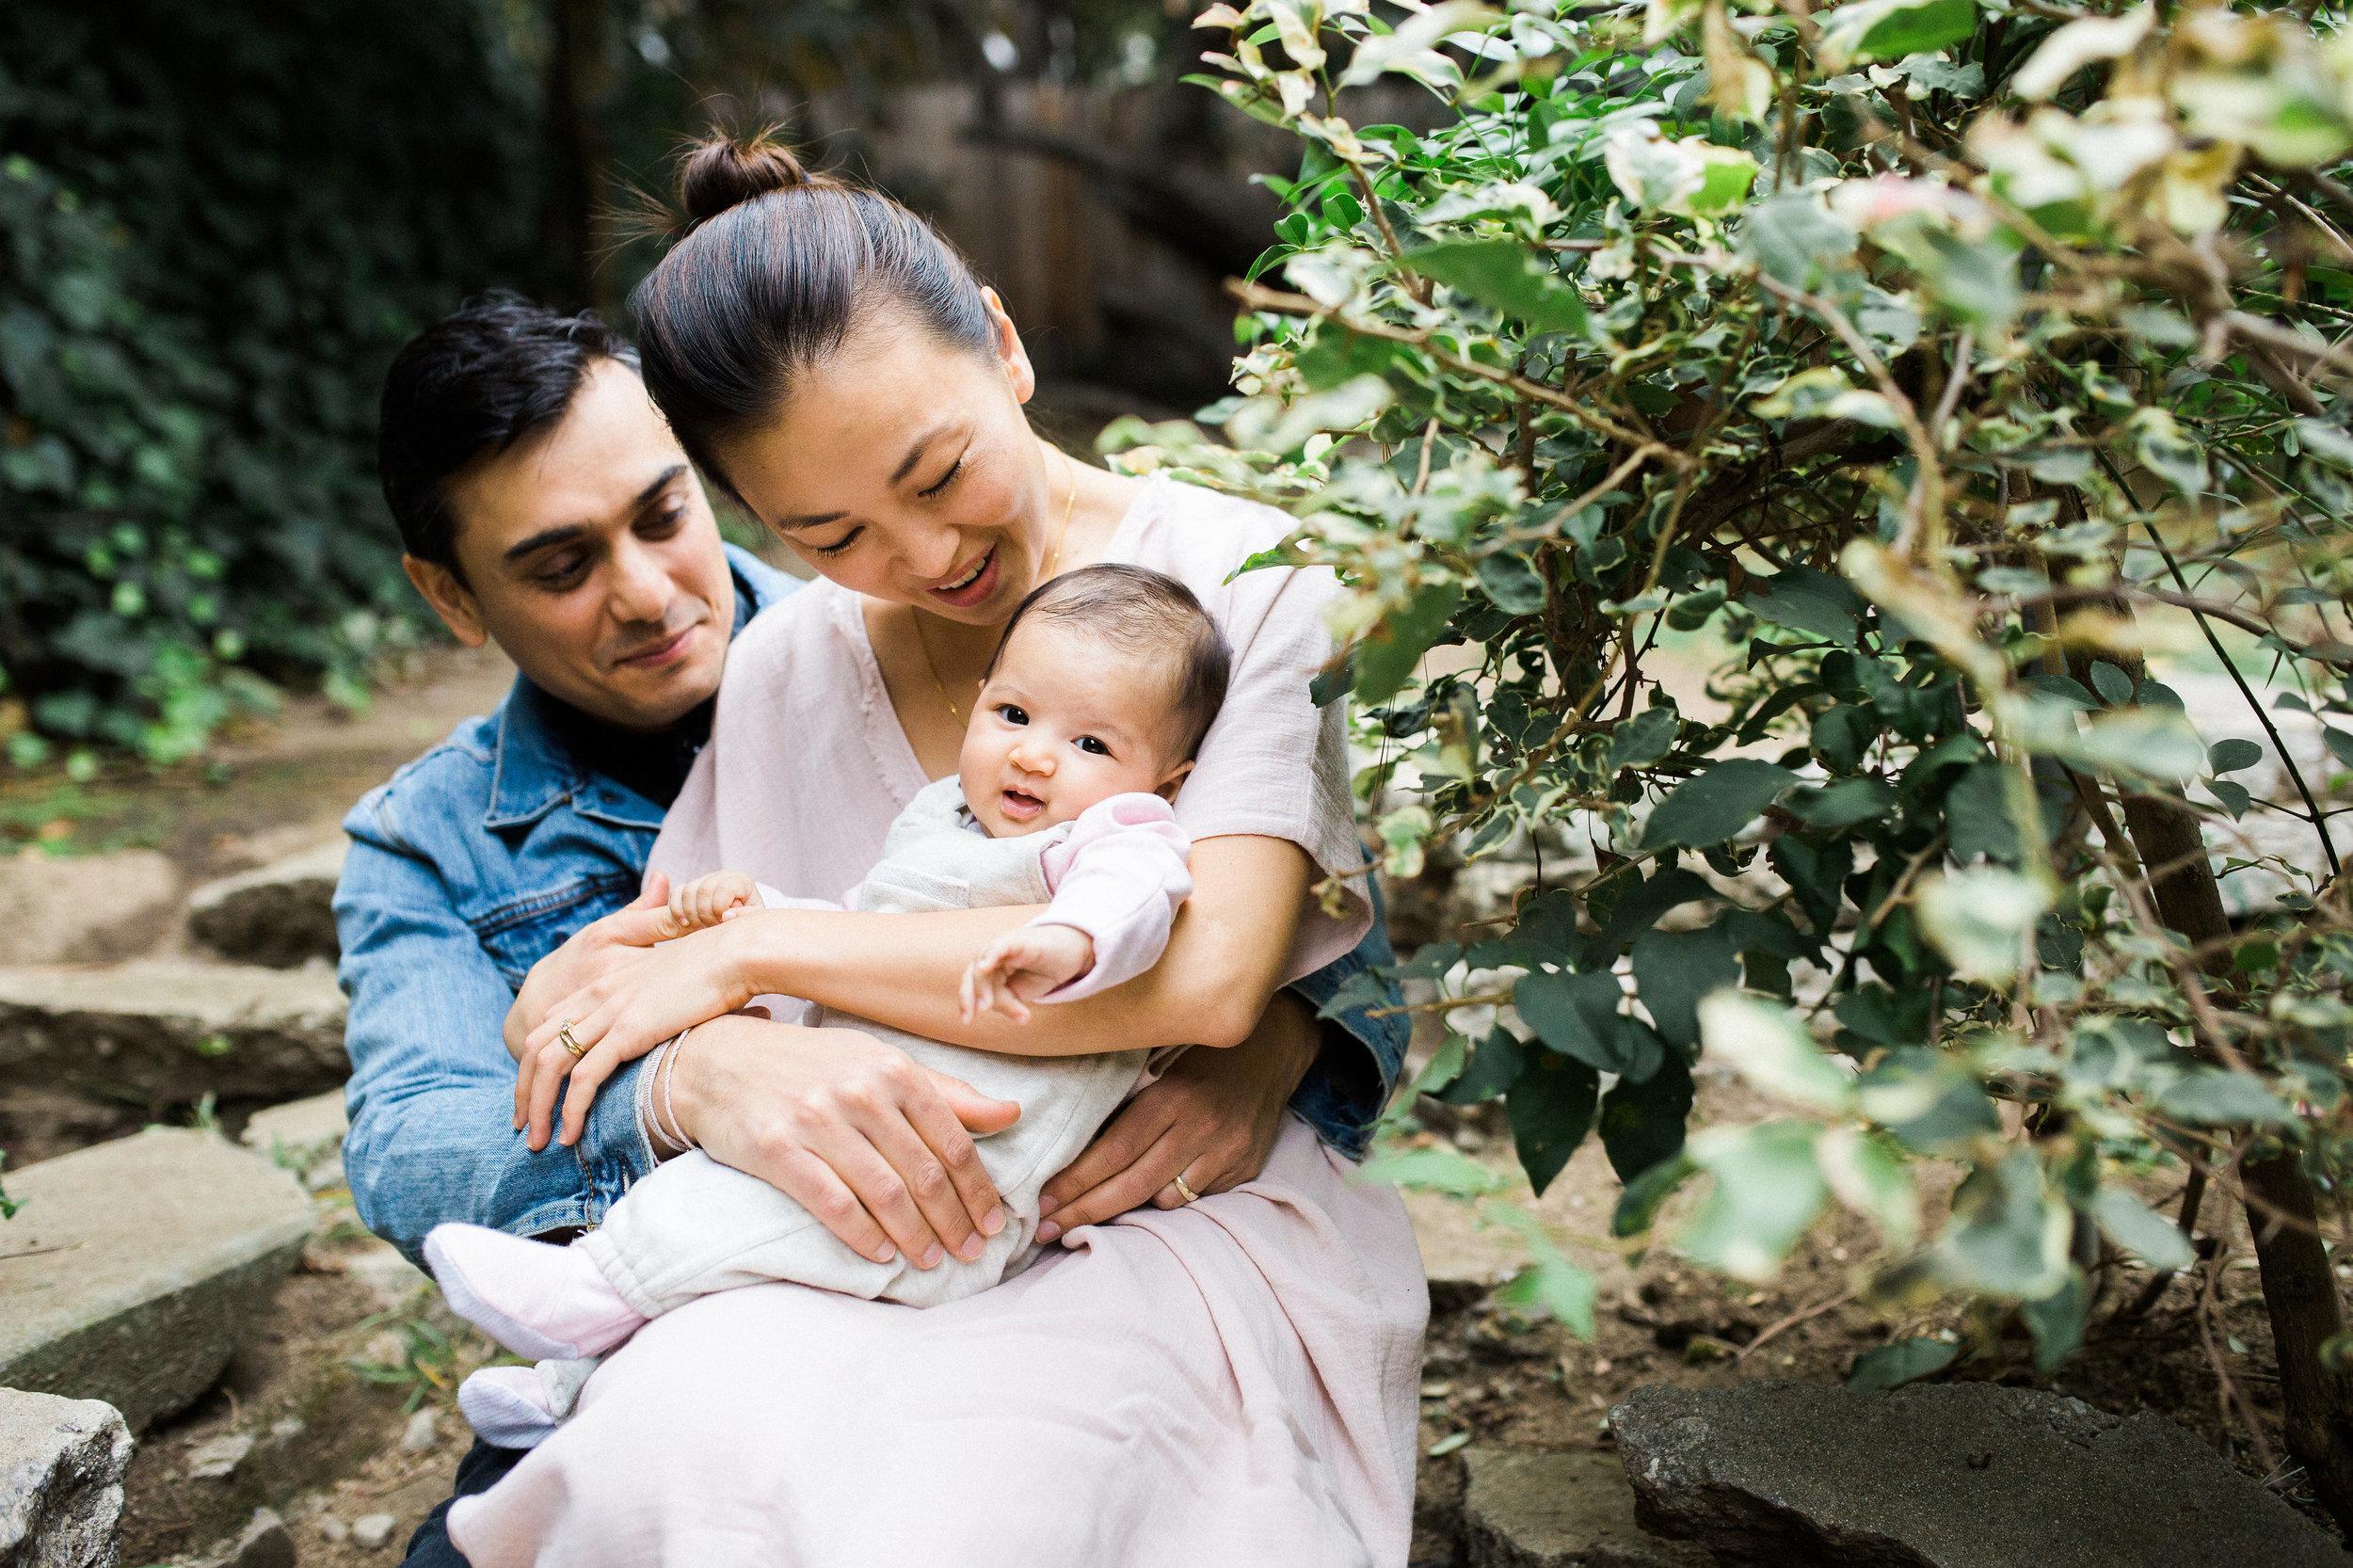 mehana-family-session_la-los-angeles-family-photographer-56.jpg